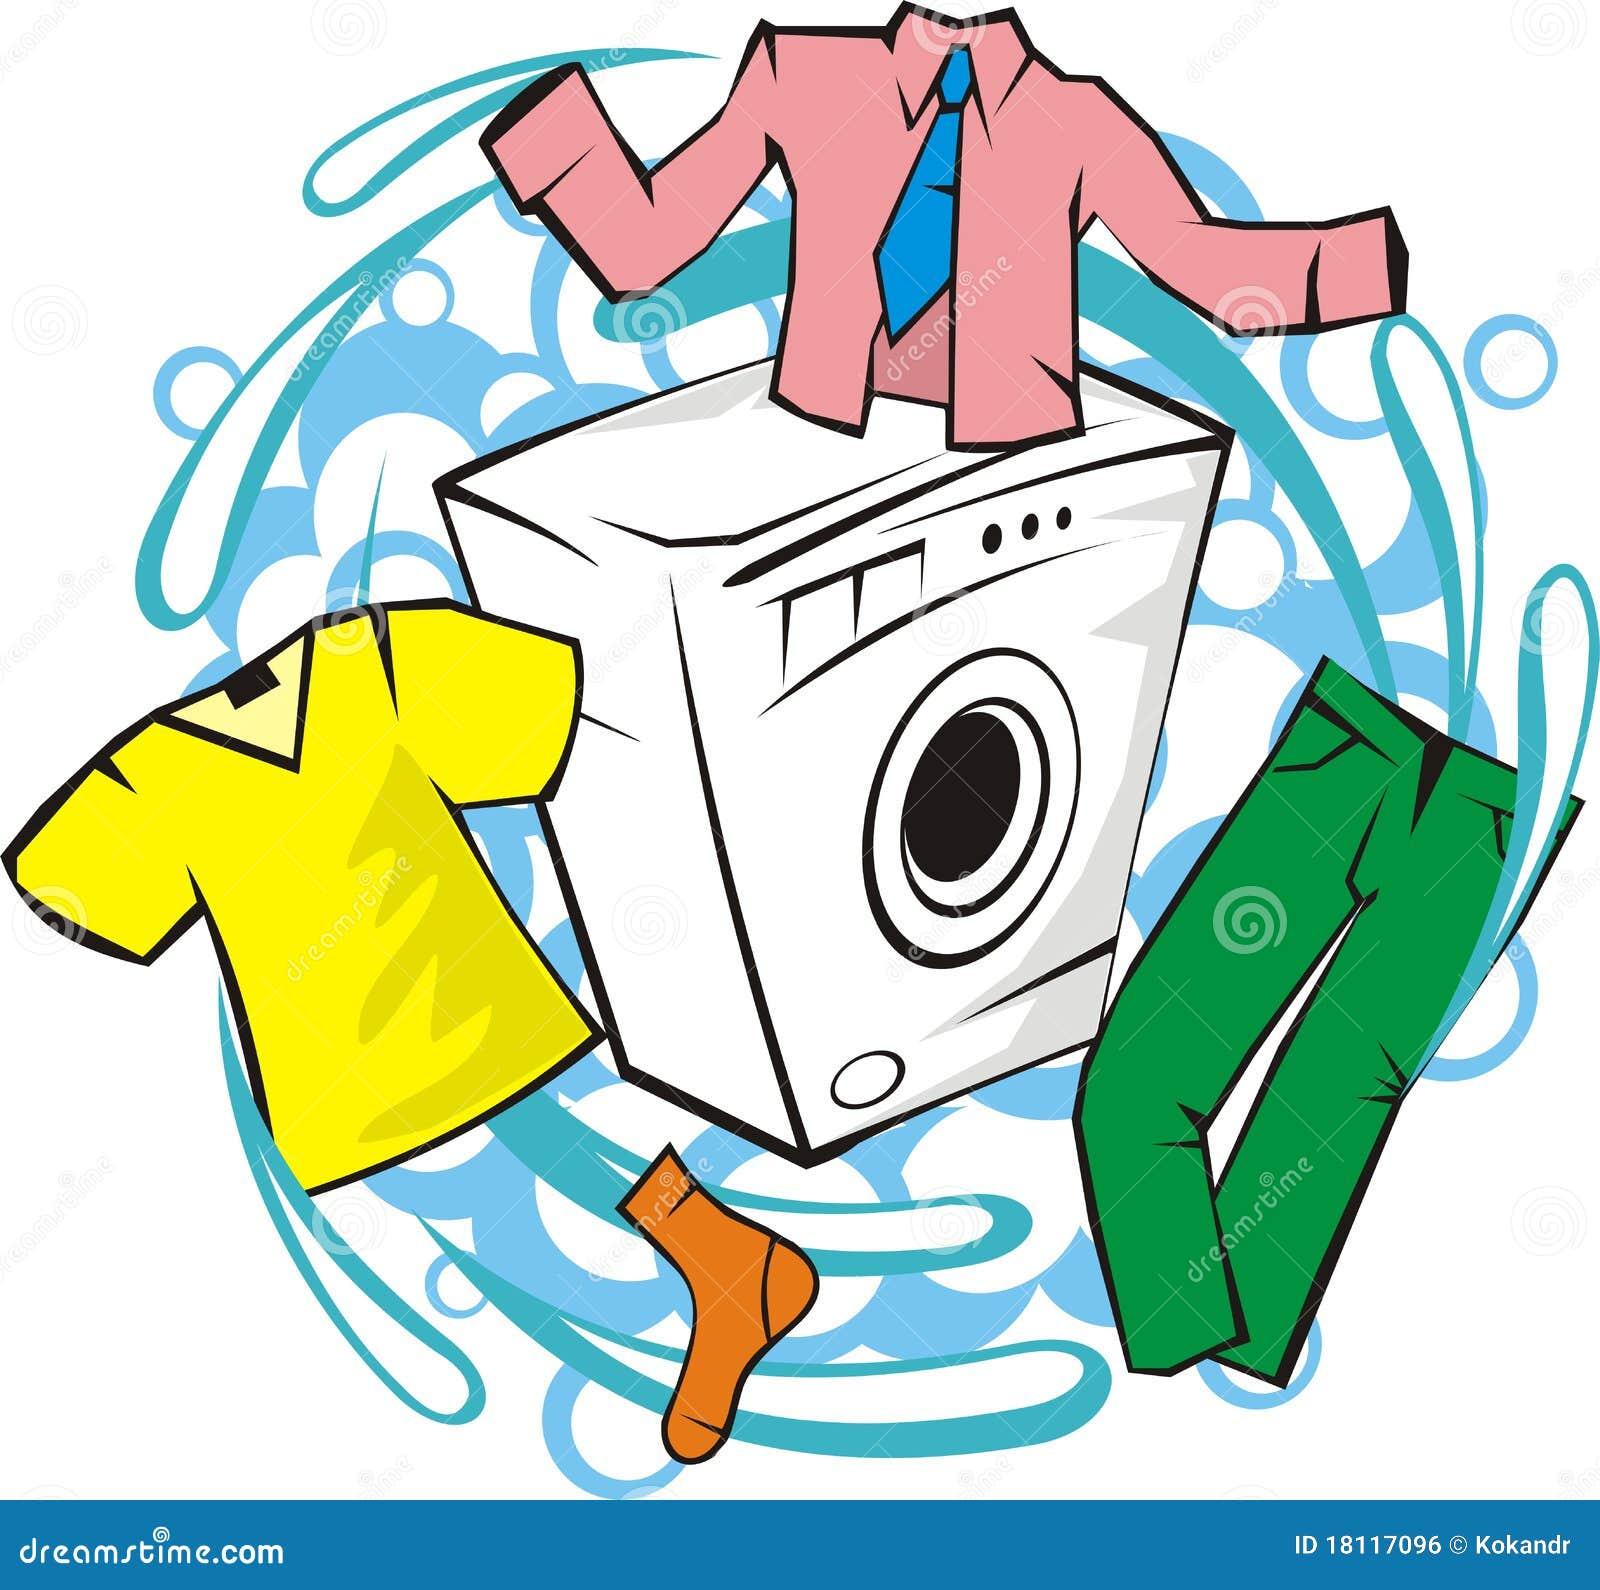 Wash Service Royalty Free Stock Image - Image: 18117096